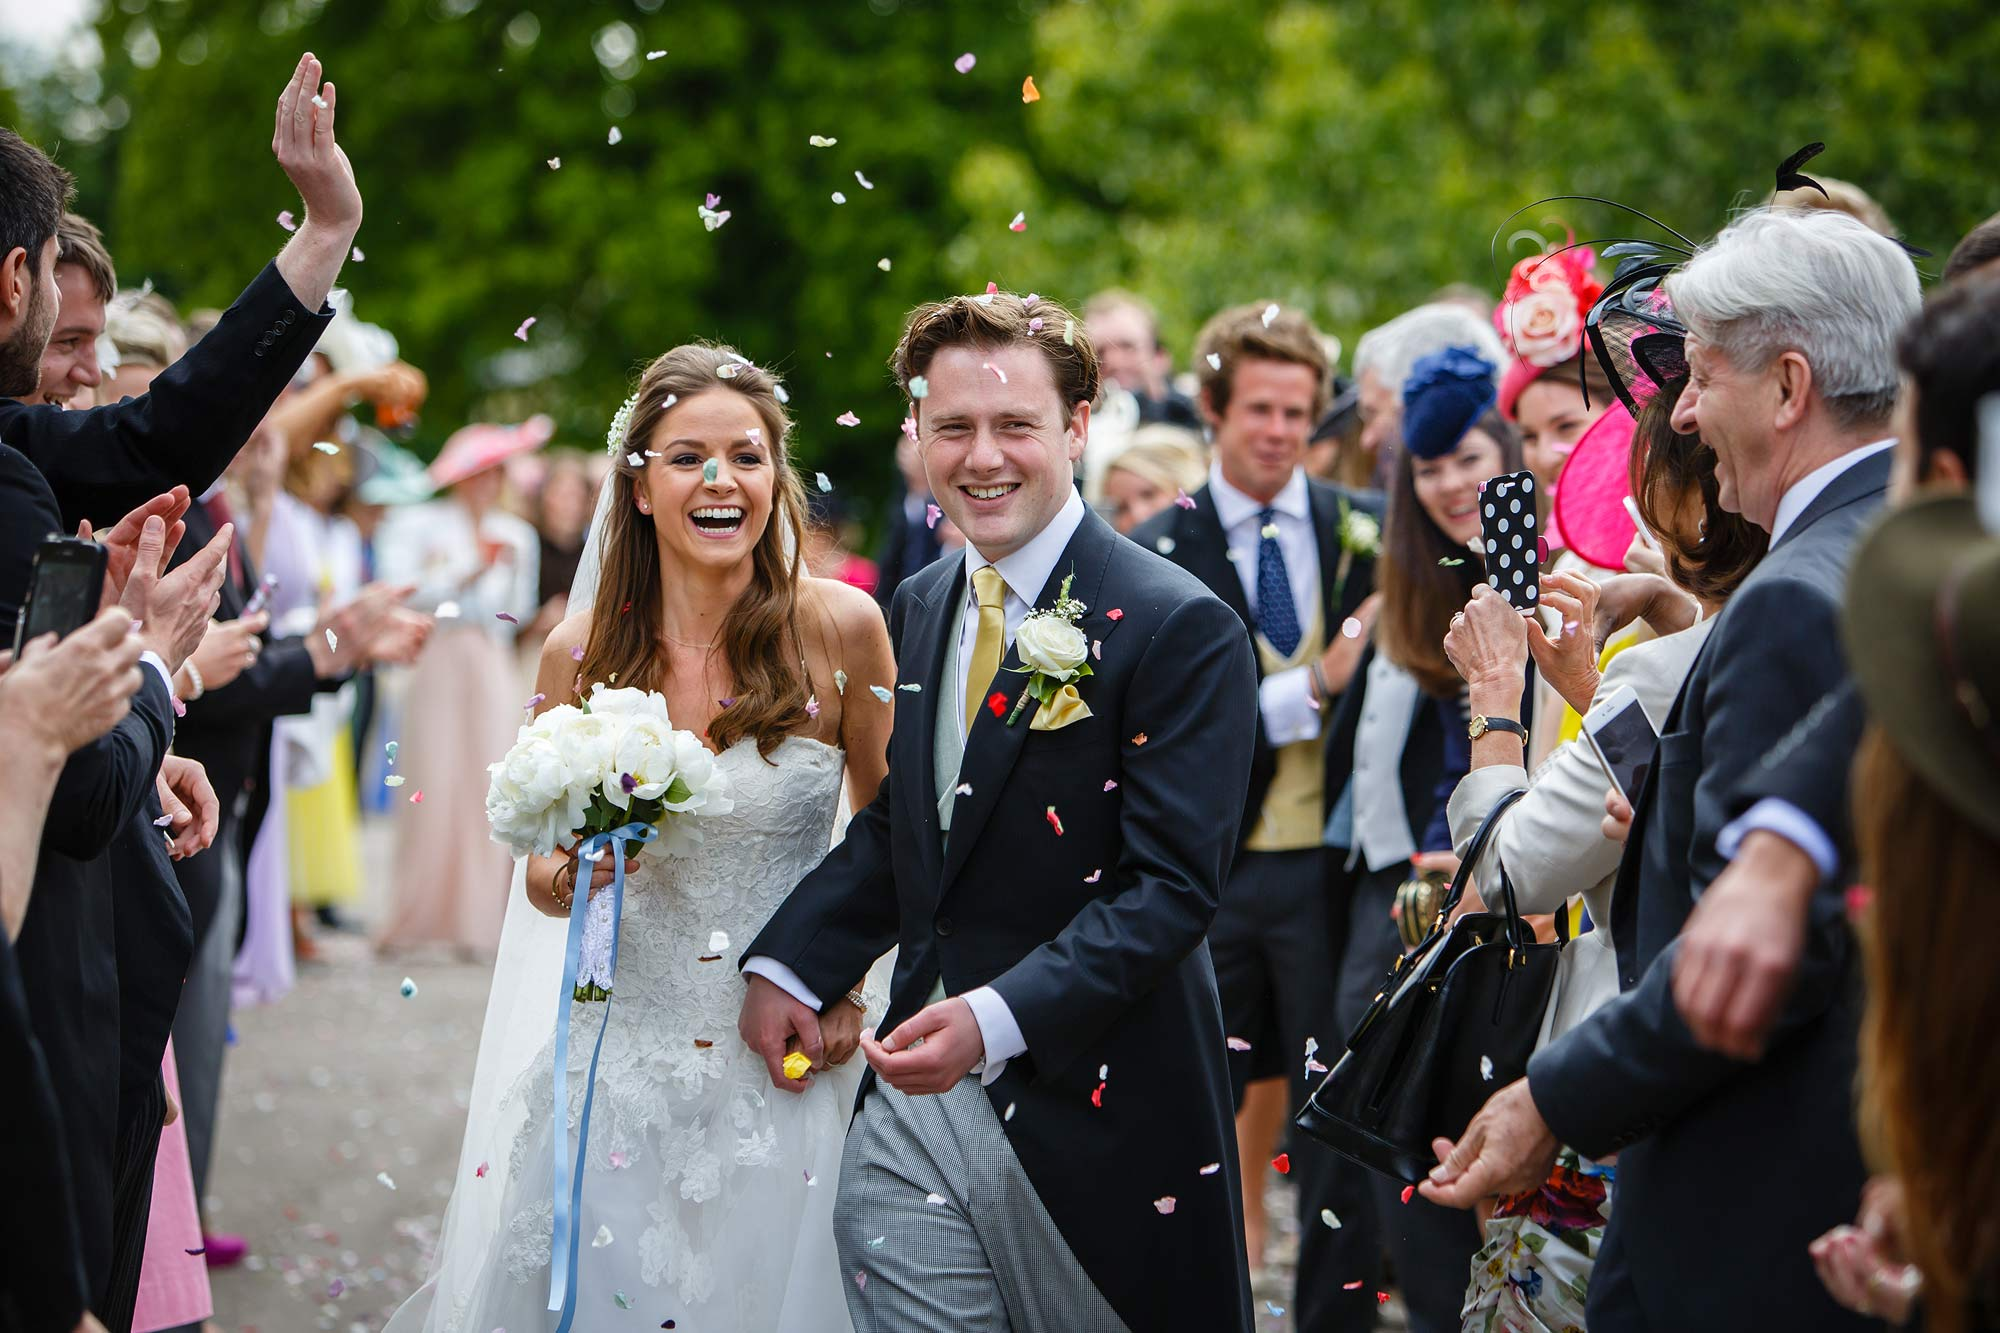 chislehurst wedding photos